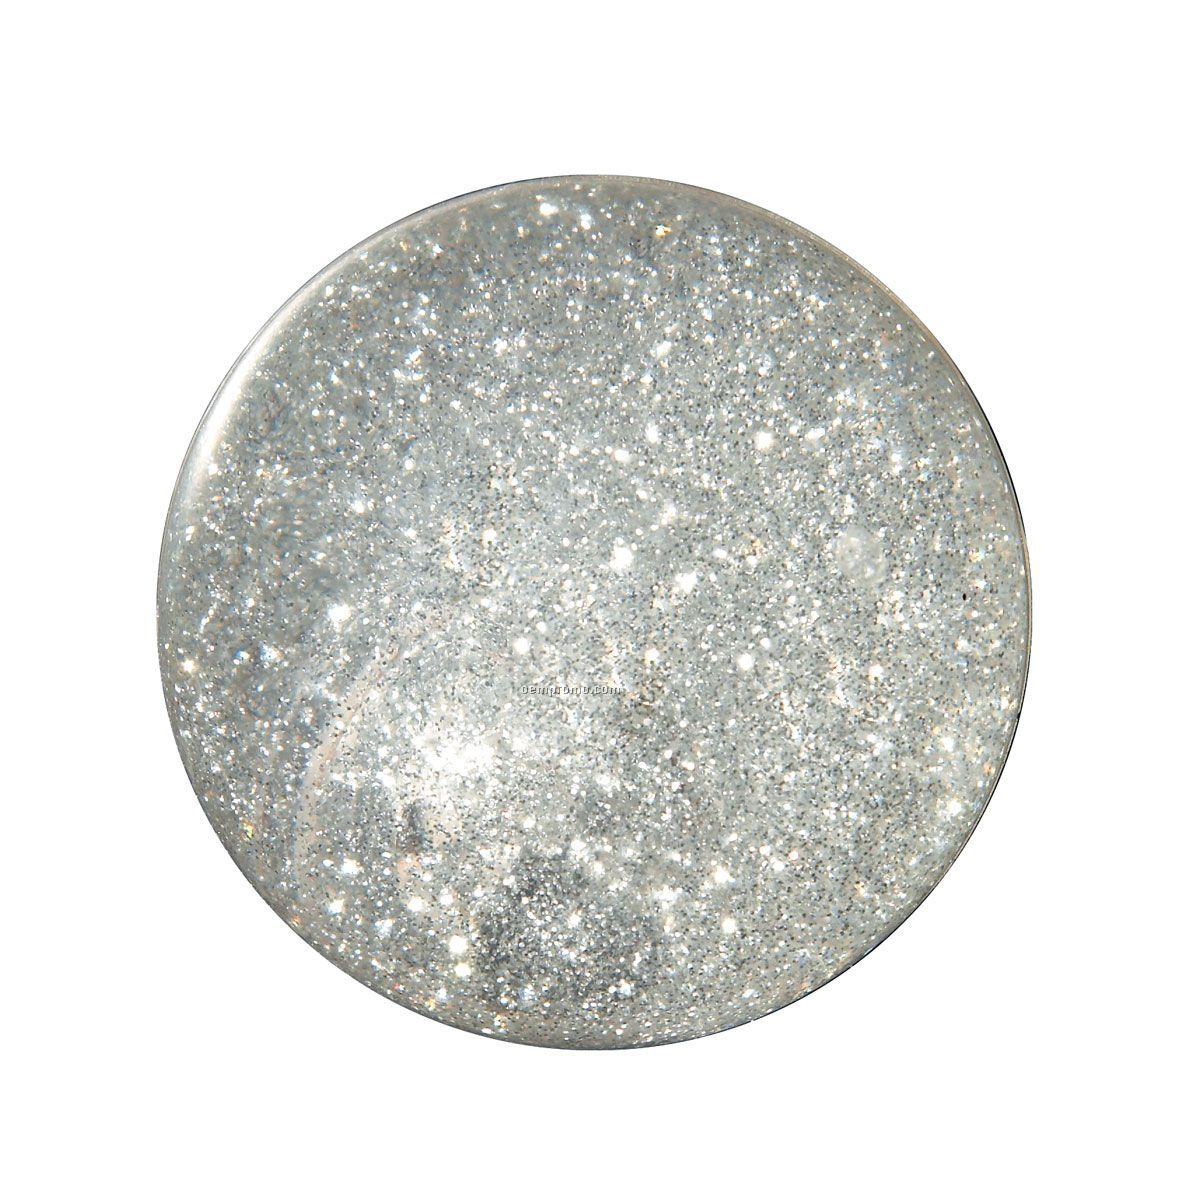 Glitter Light Up Bouncy Ball Silver China Wholesale